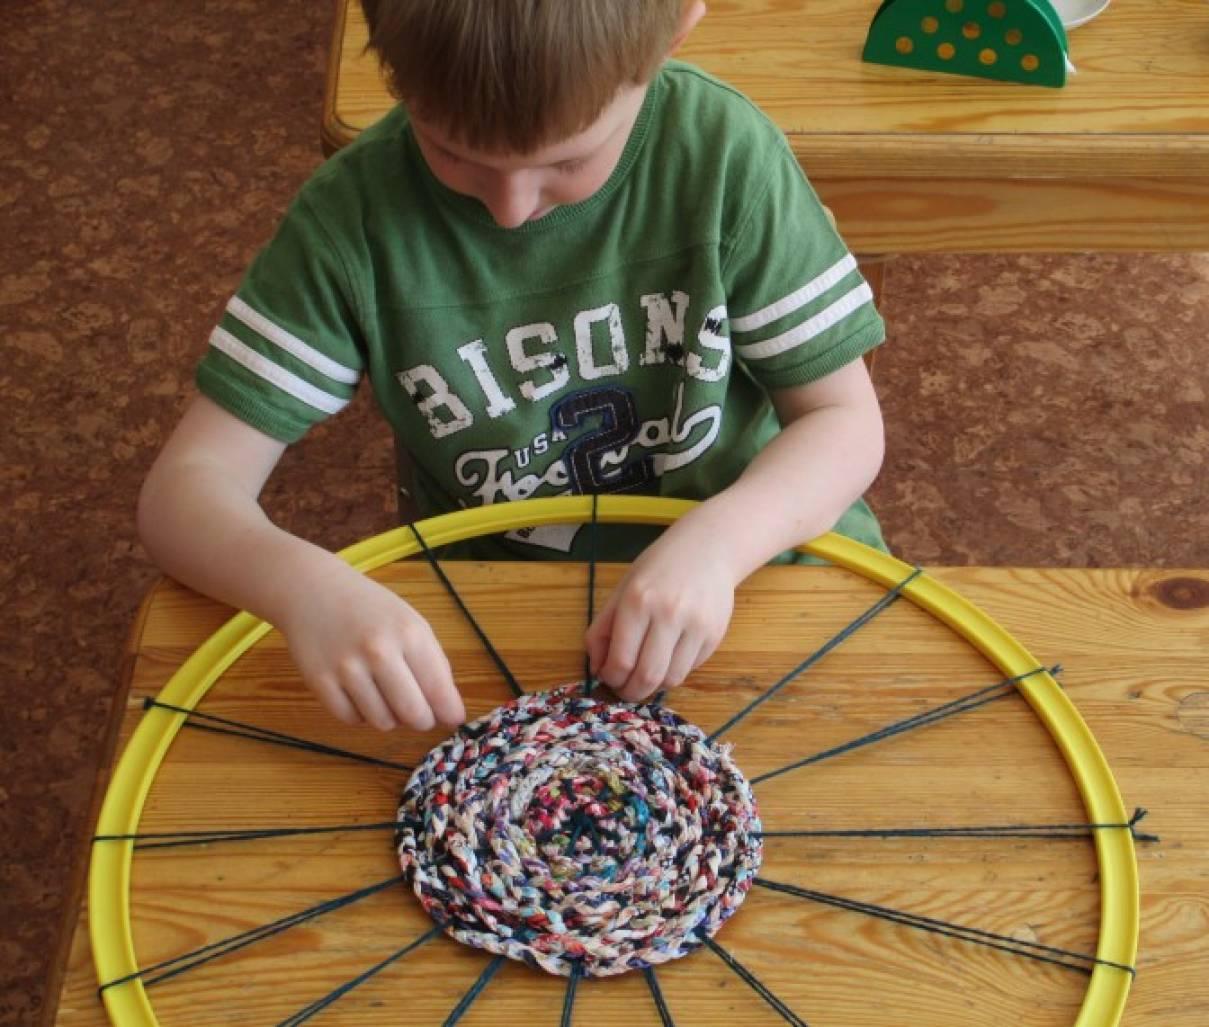 Детский коврик своими руками мастер класс фото7